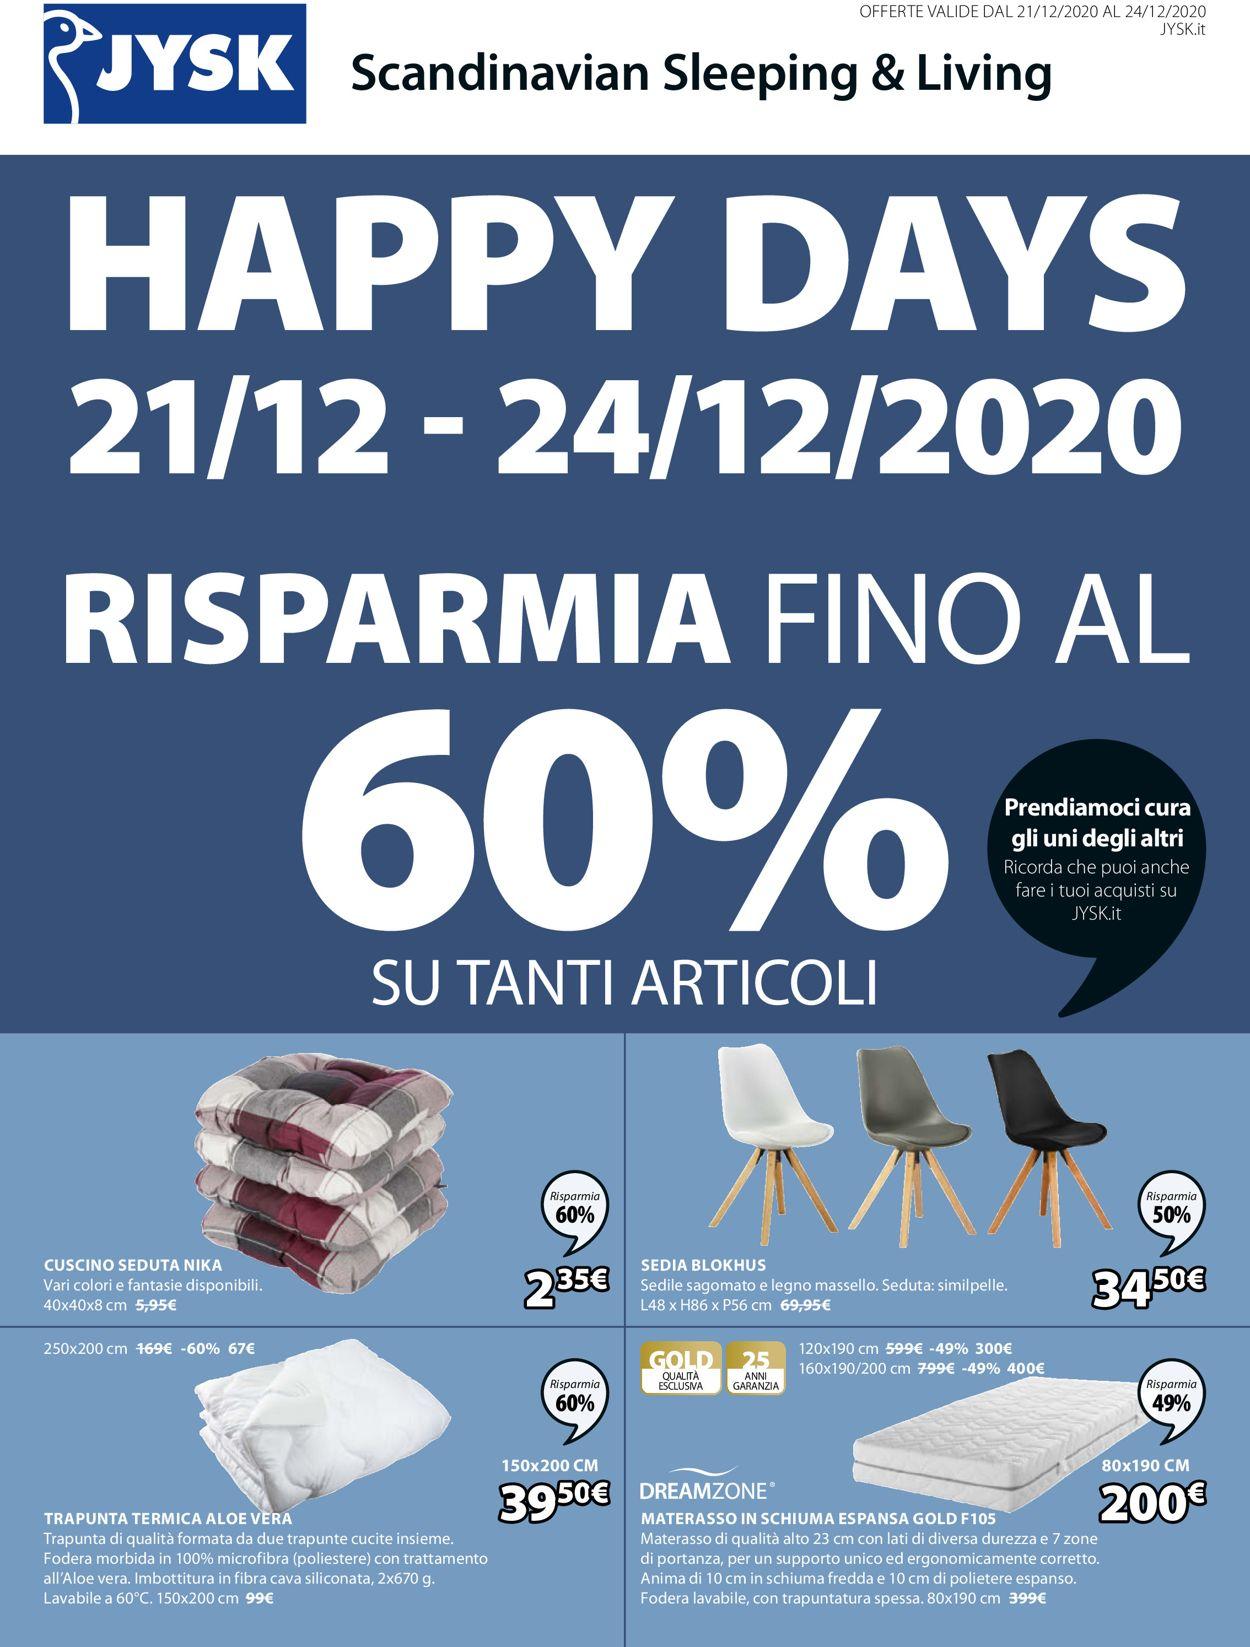 Volantino Jysk - Natale 2020 - Offerte 21/12-24/12/2020